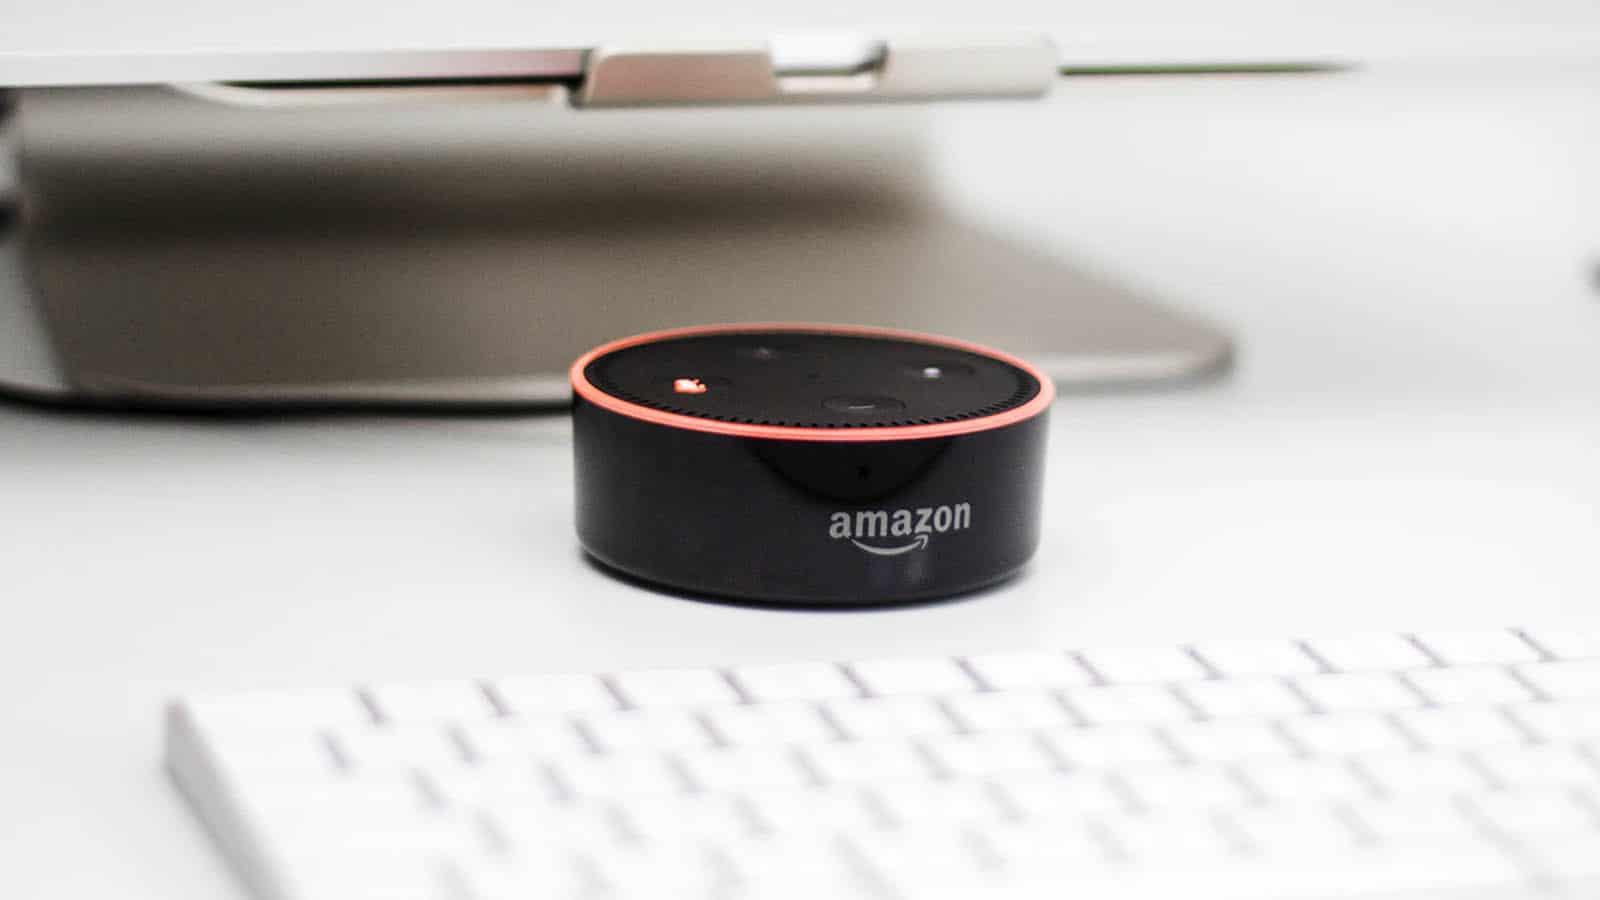 amazon echo smart speaker with alexa